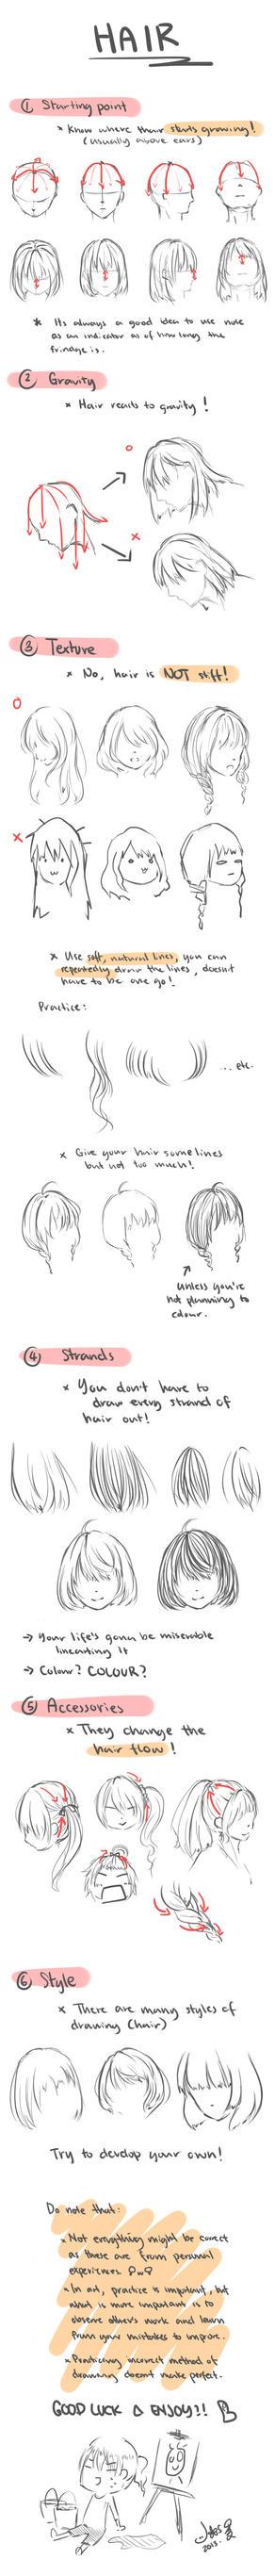 Hair tutorial by Viatasi